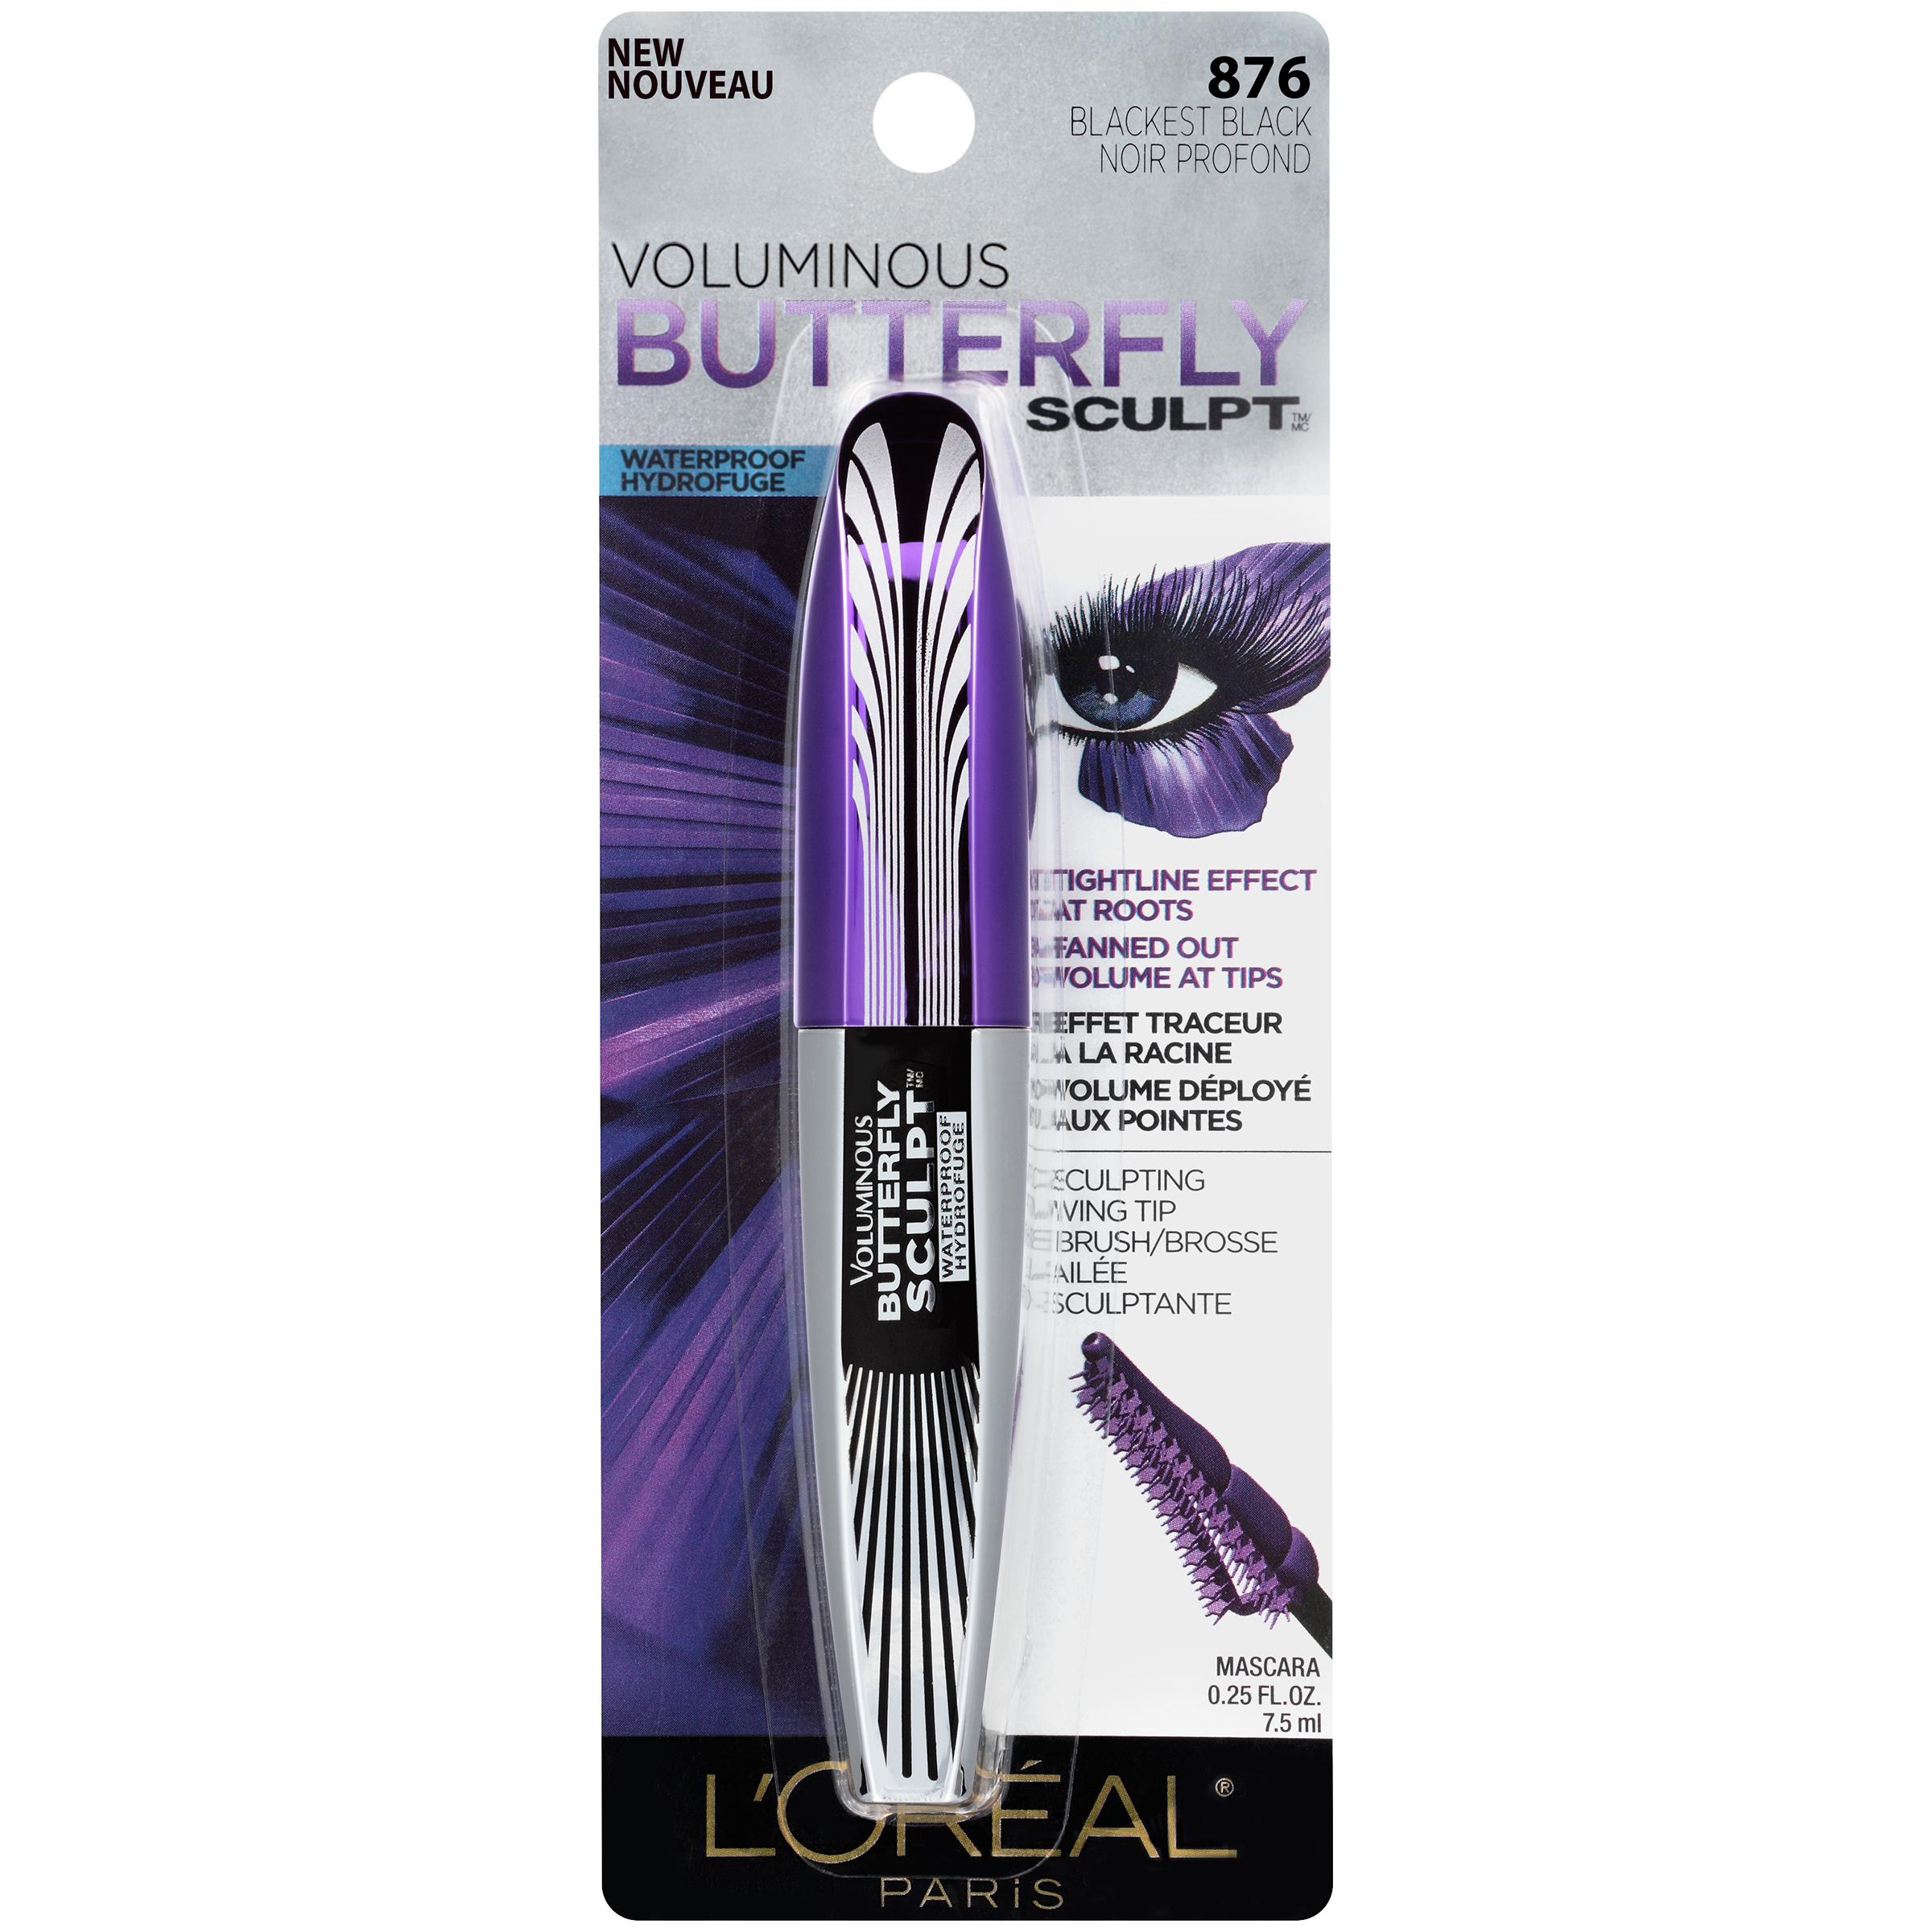 Loreal x fiber mascara waterproof